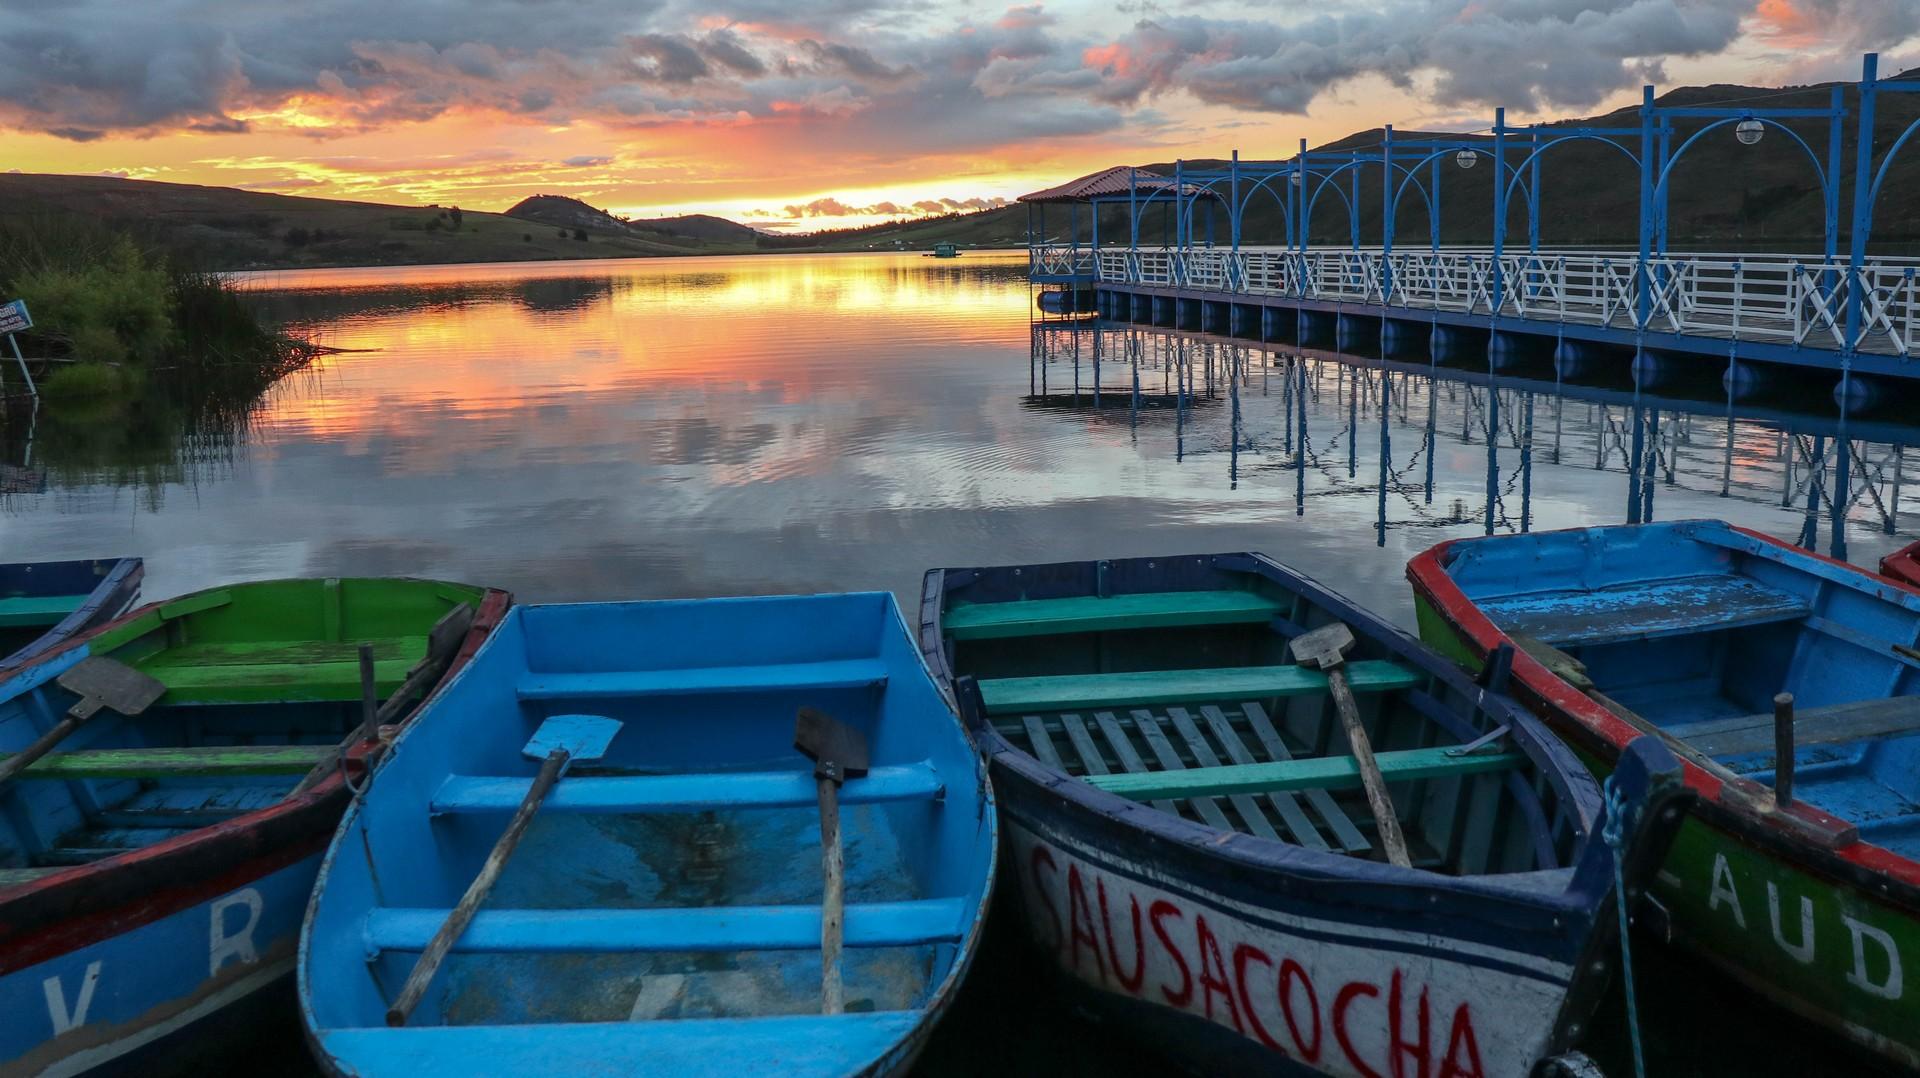 2019-04-27 Cajabamba_Laguna Sausacocha-61